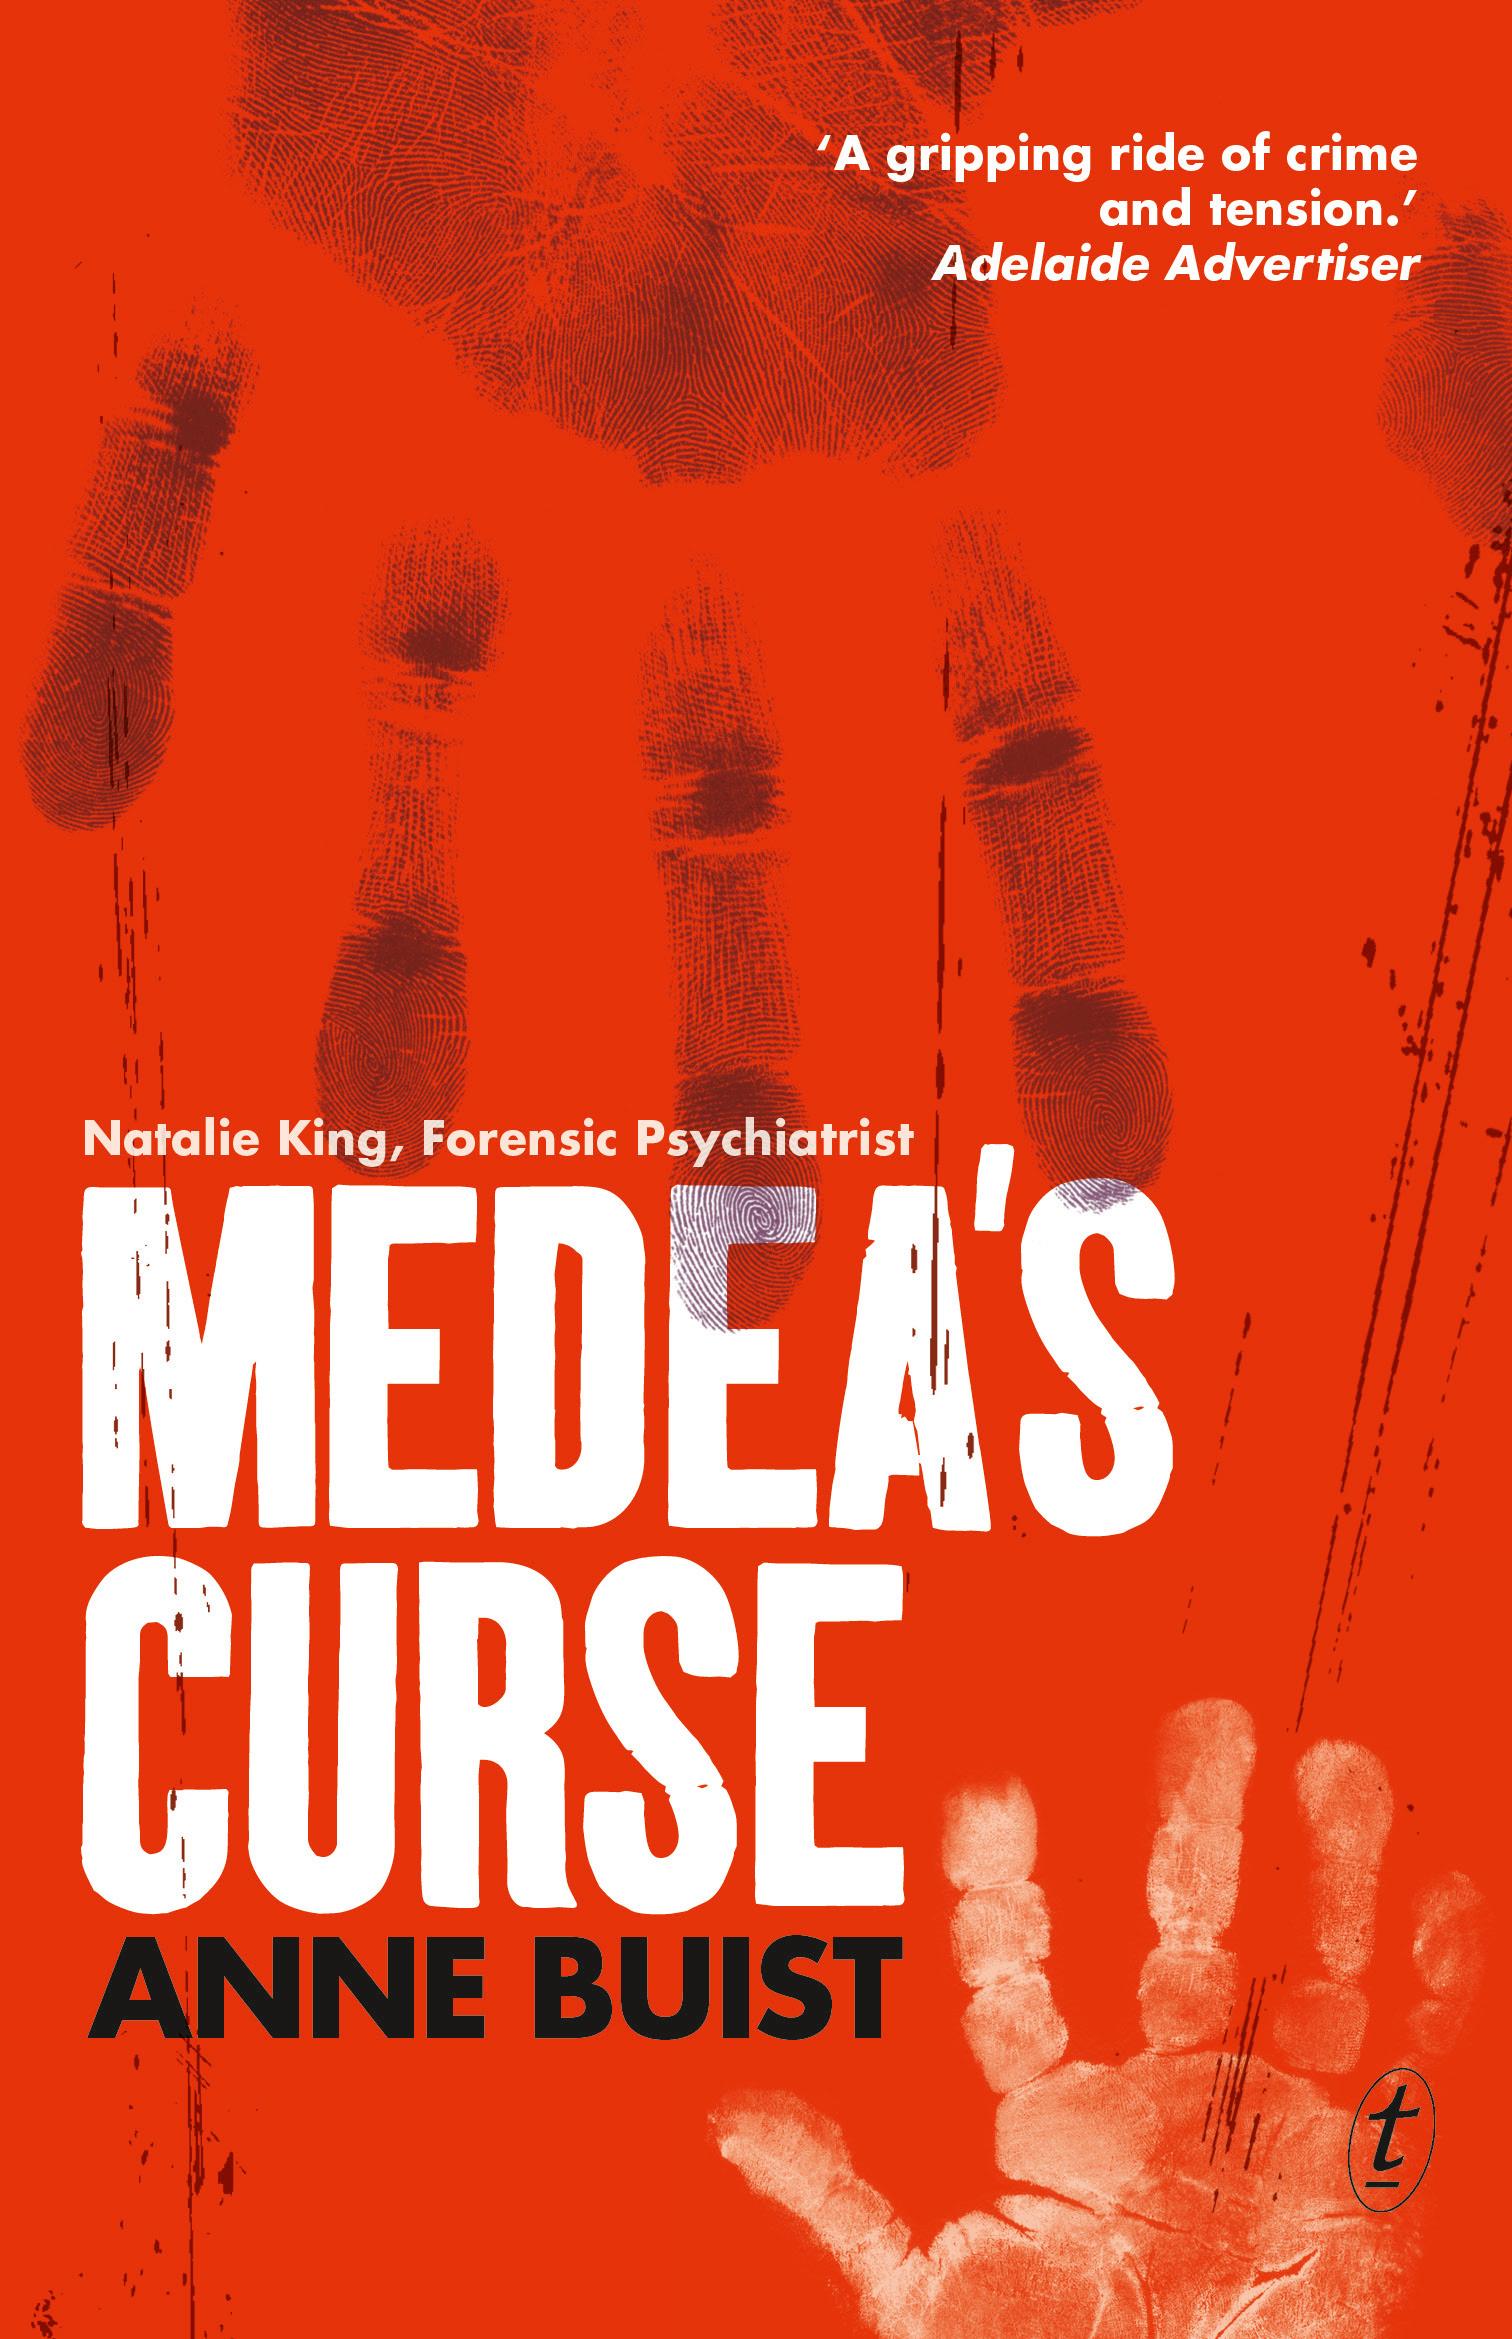 Medeas Curse  by  Anne Buist